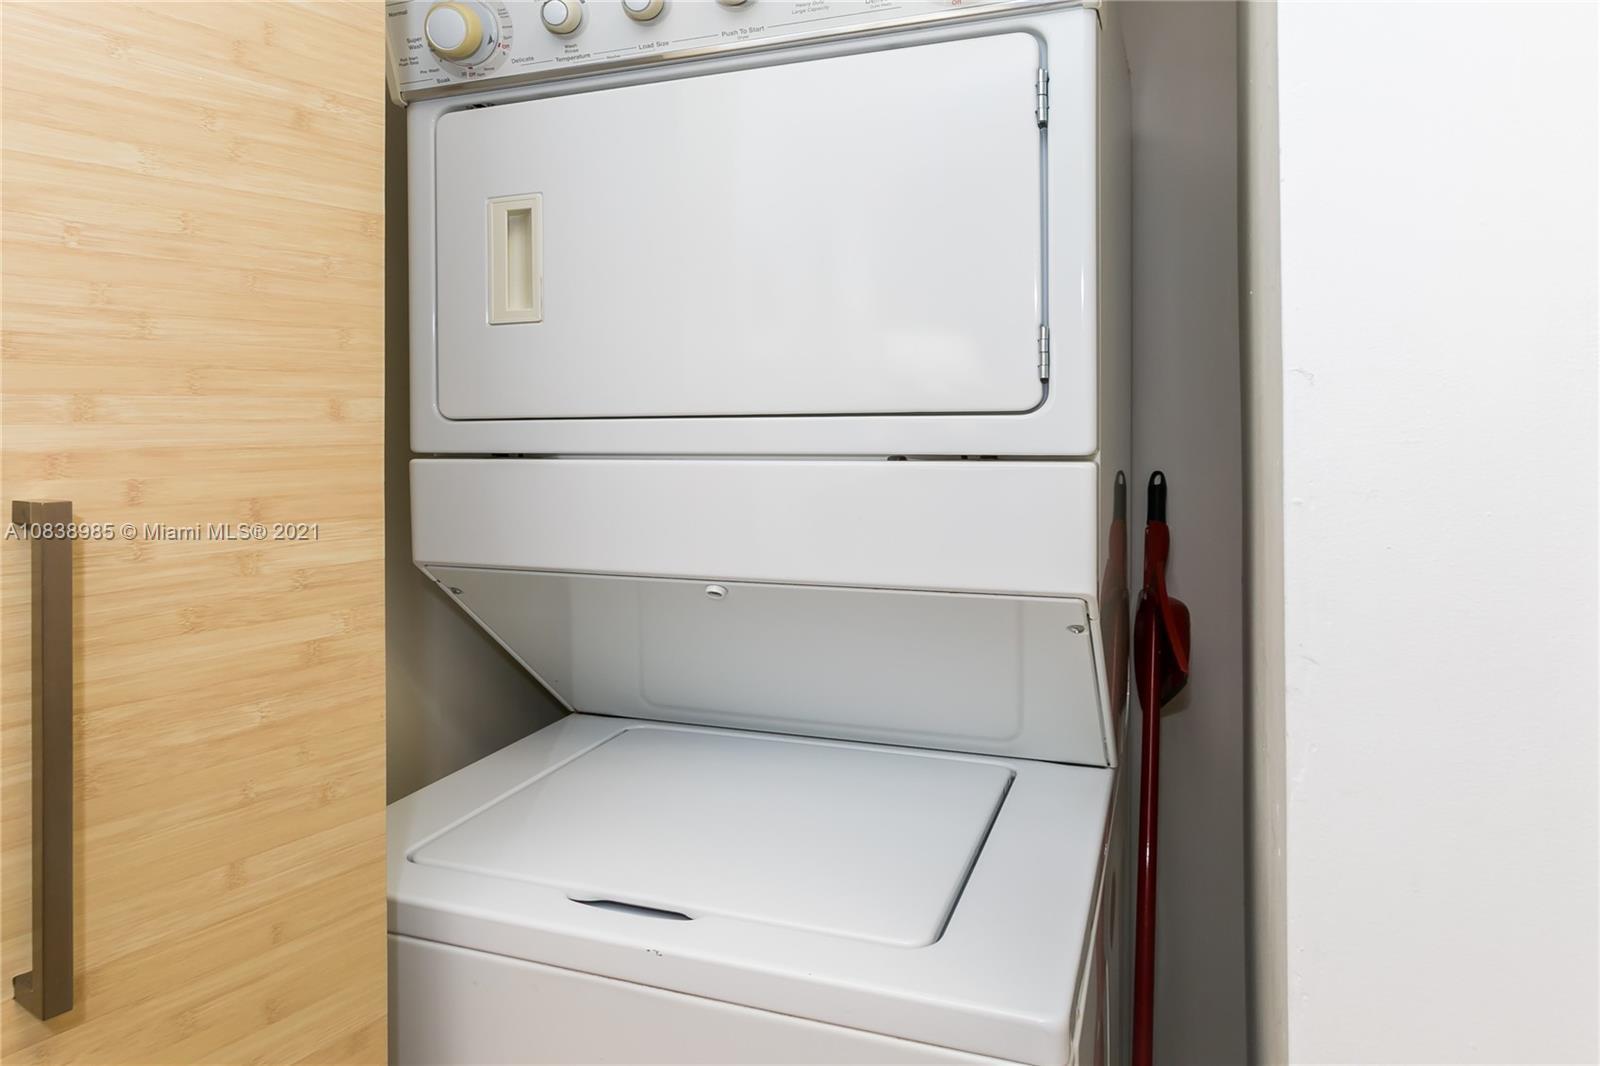 4010 2 / 2 1337 sq. ft. $ 2020-09-25 0 Photo